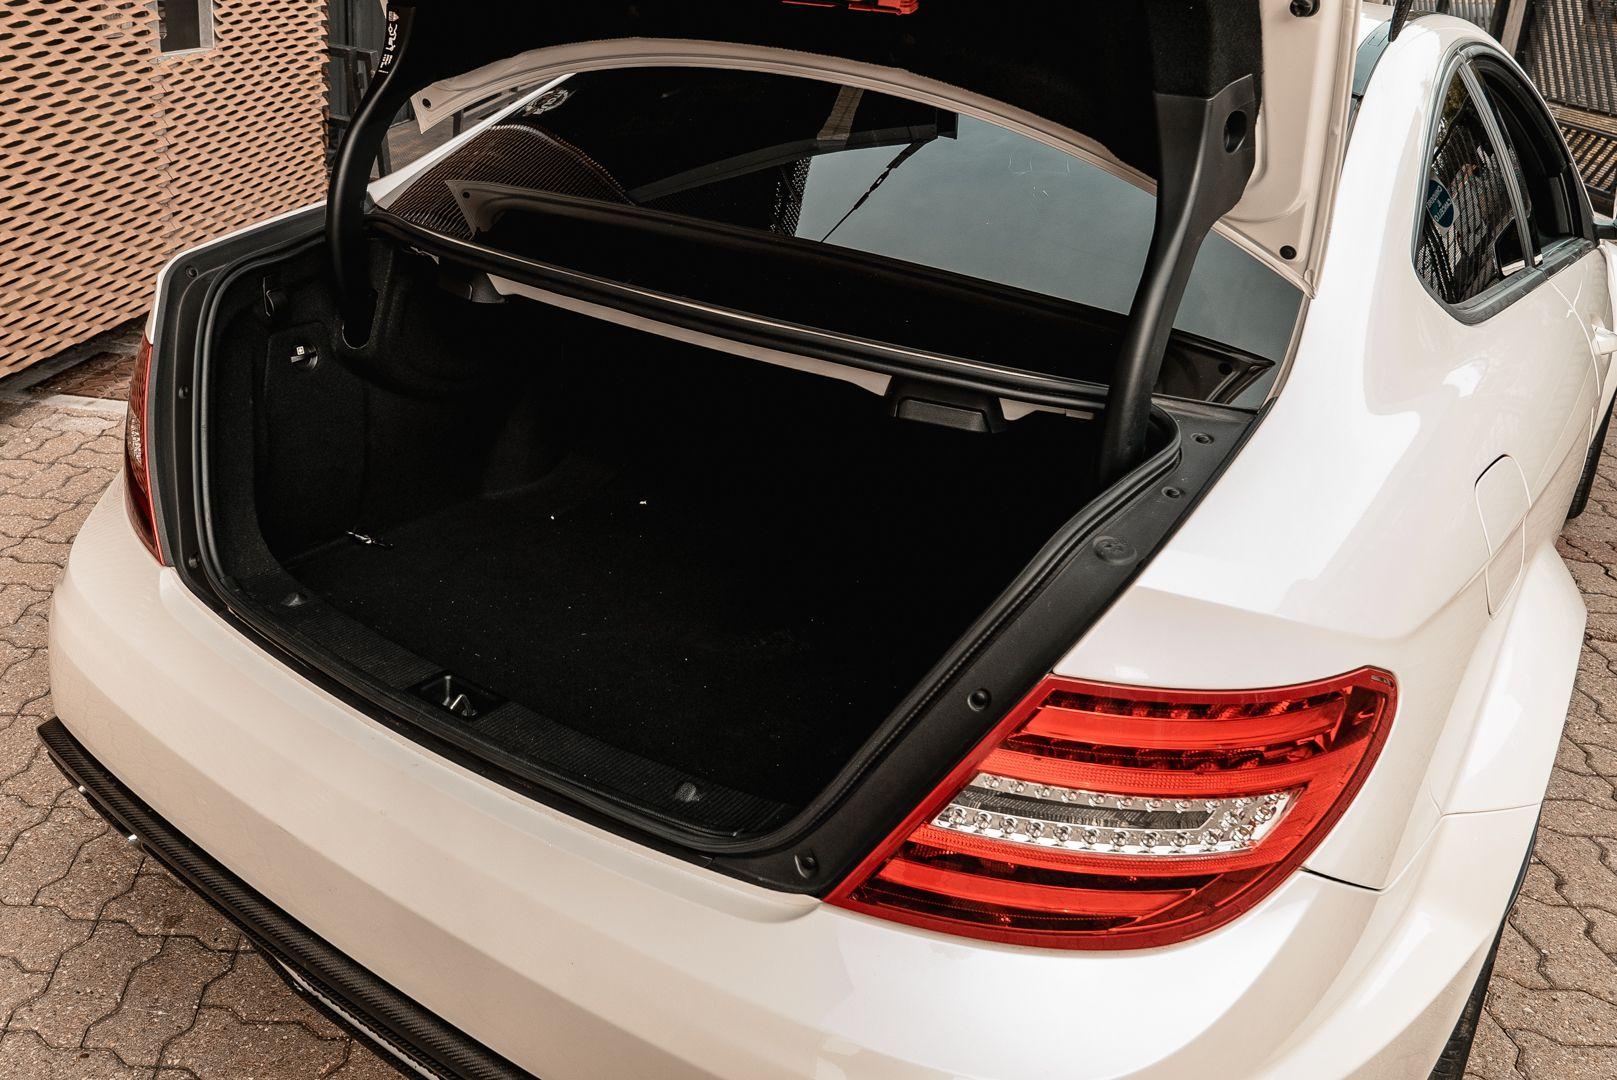 2012 Mercedes-Benz C63 AMG Black Series 71807